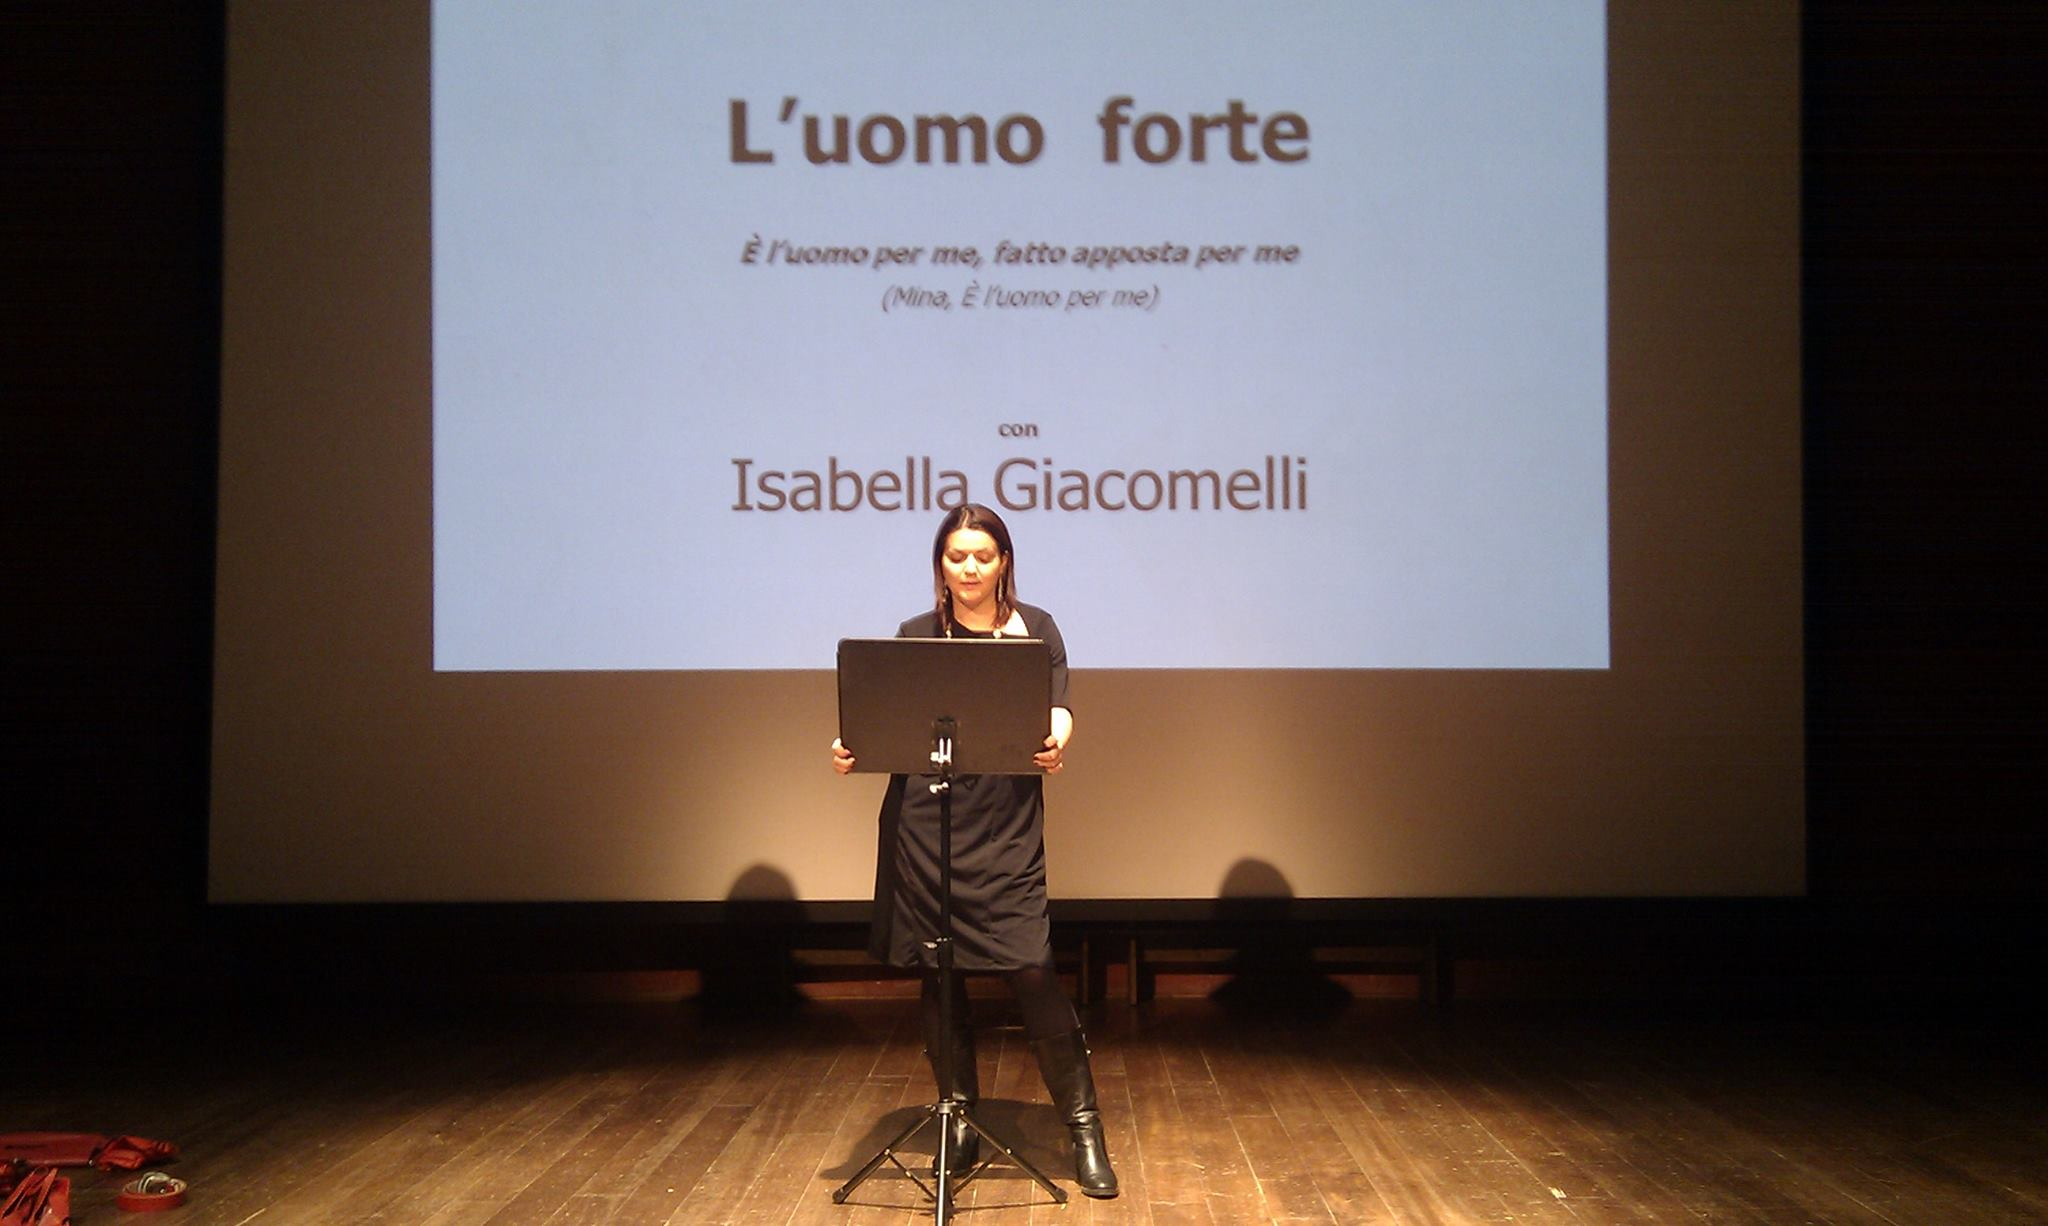 7_LuomoForte_IsabellaGiacomelli